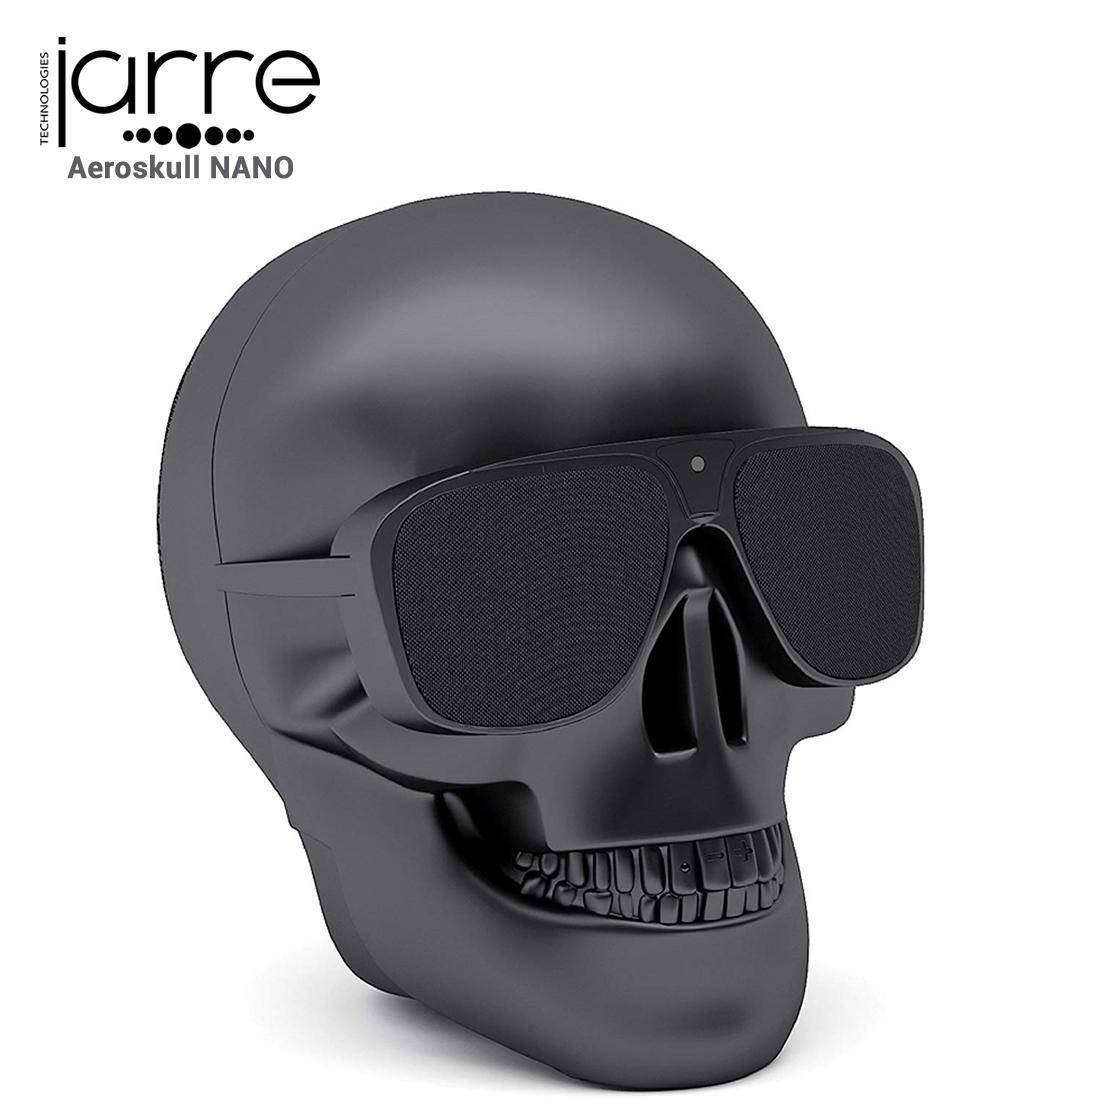 JARRE Enceinte Bluetooth, [AeroSkull Nano] Black Mate